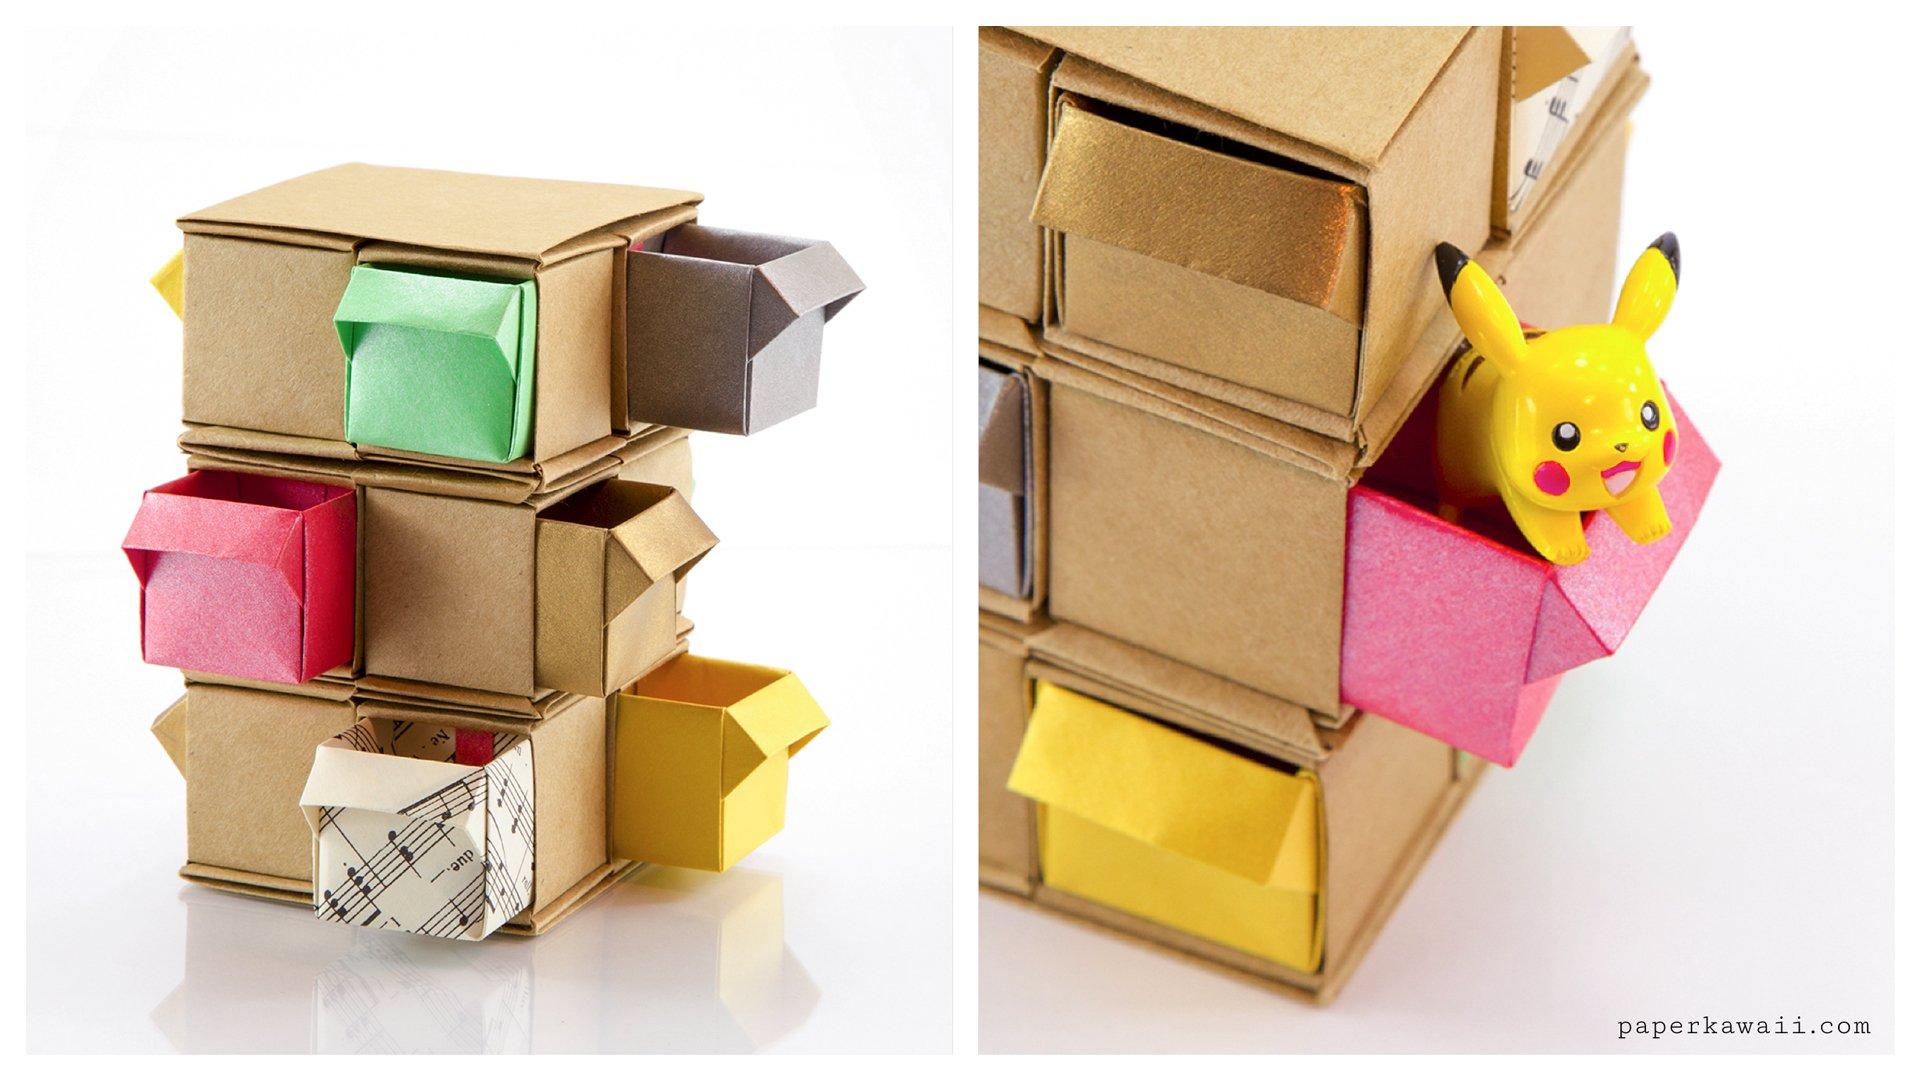 Paper Kawaii - Free origami instructions, photo & video ... - photo#40